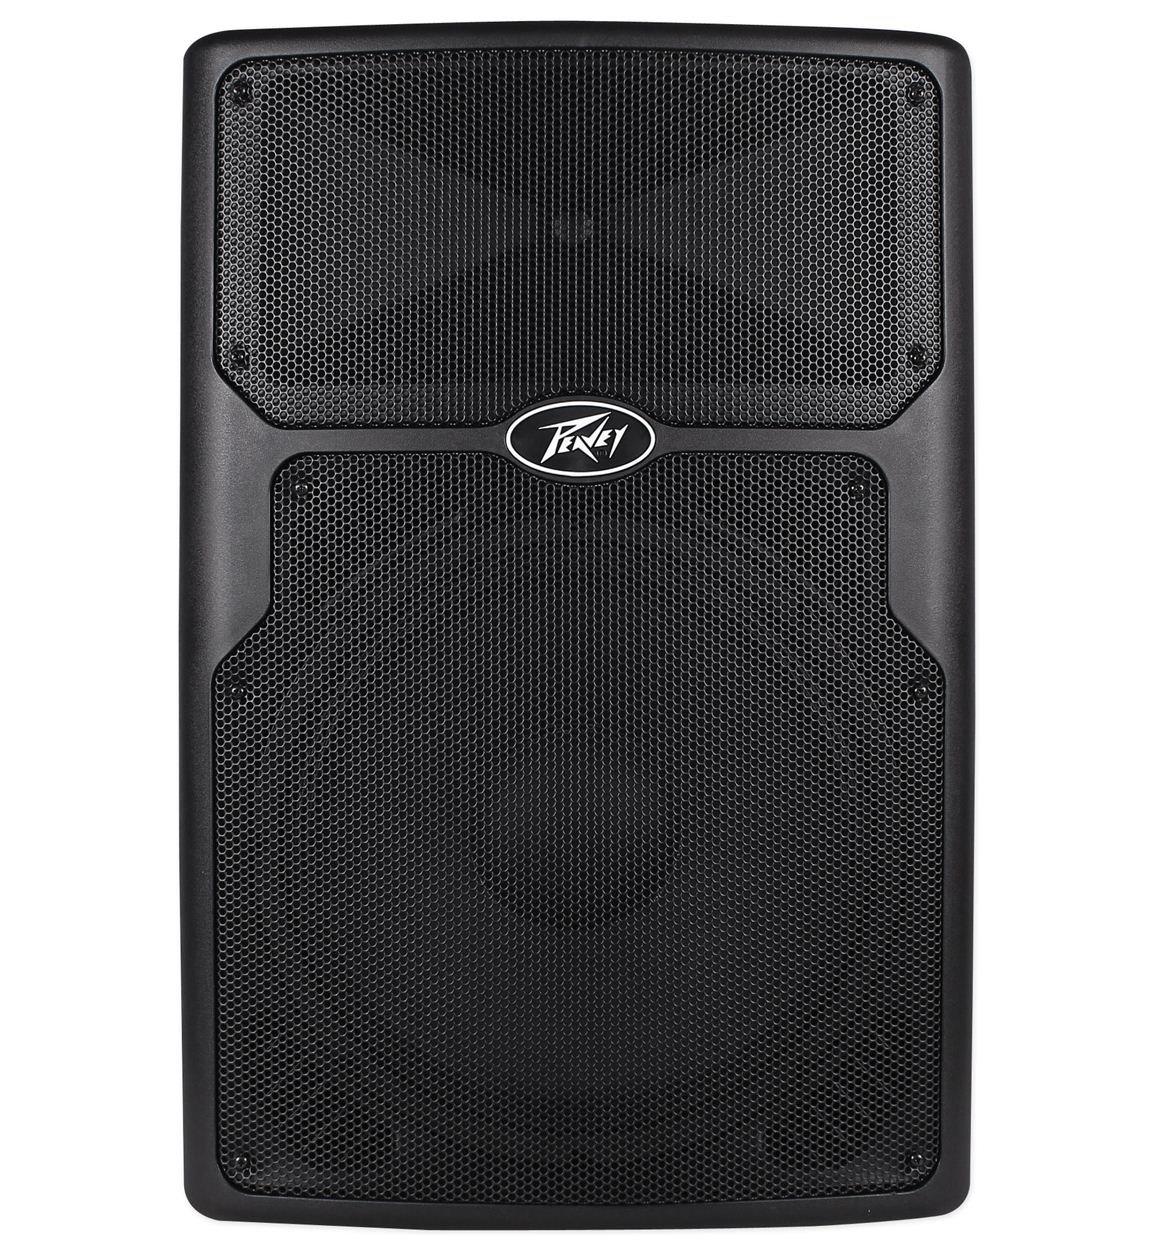 Peavey PVx15 15'' 800-Watt Passive PA Loudspeaker with RX14 Driver PVX Titanium Diaphragm Compression Driver